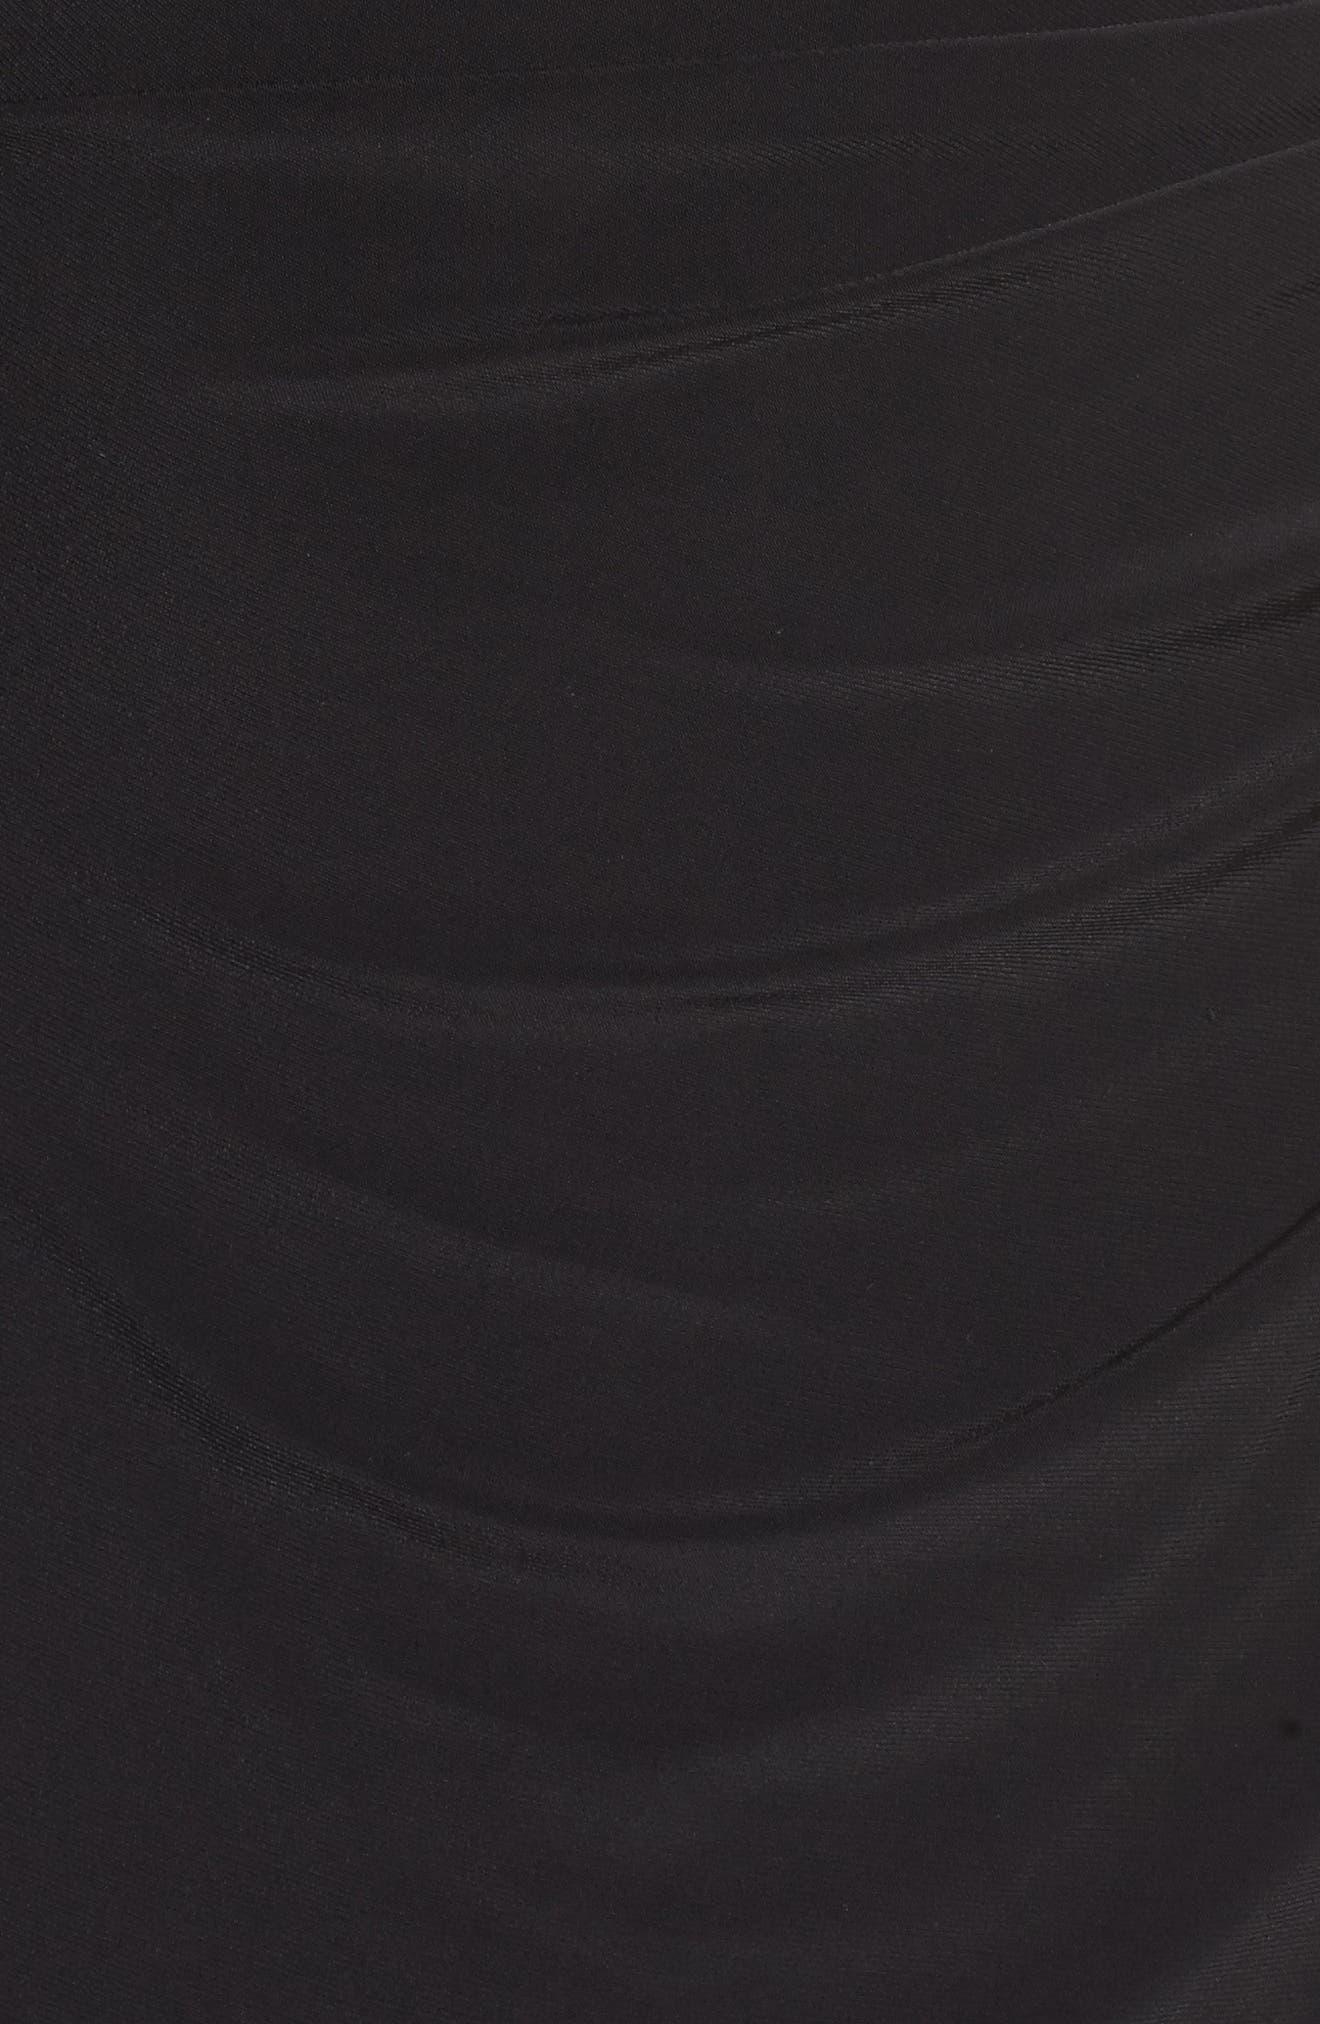 Embellished Side Tuck Jersey Gown,                             Alternate thumbnail 5, color,                             Black